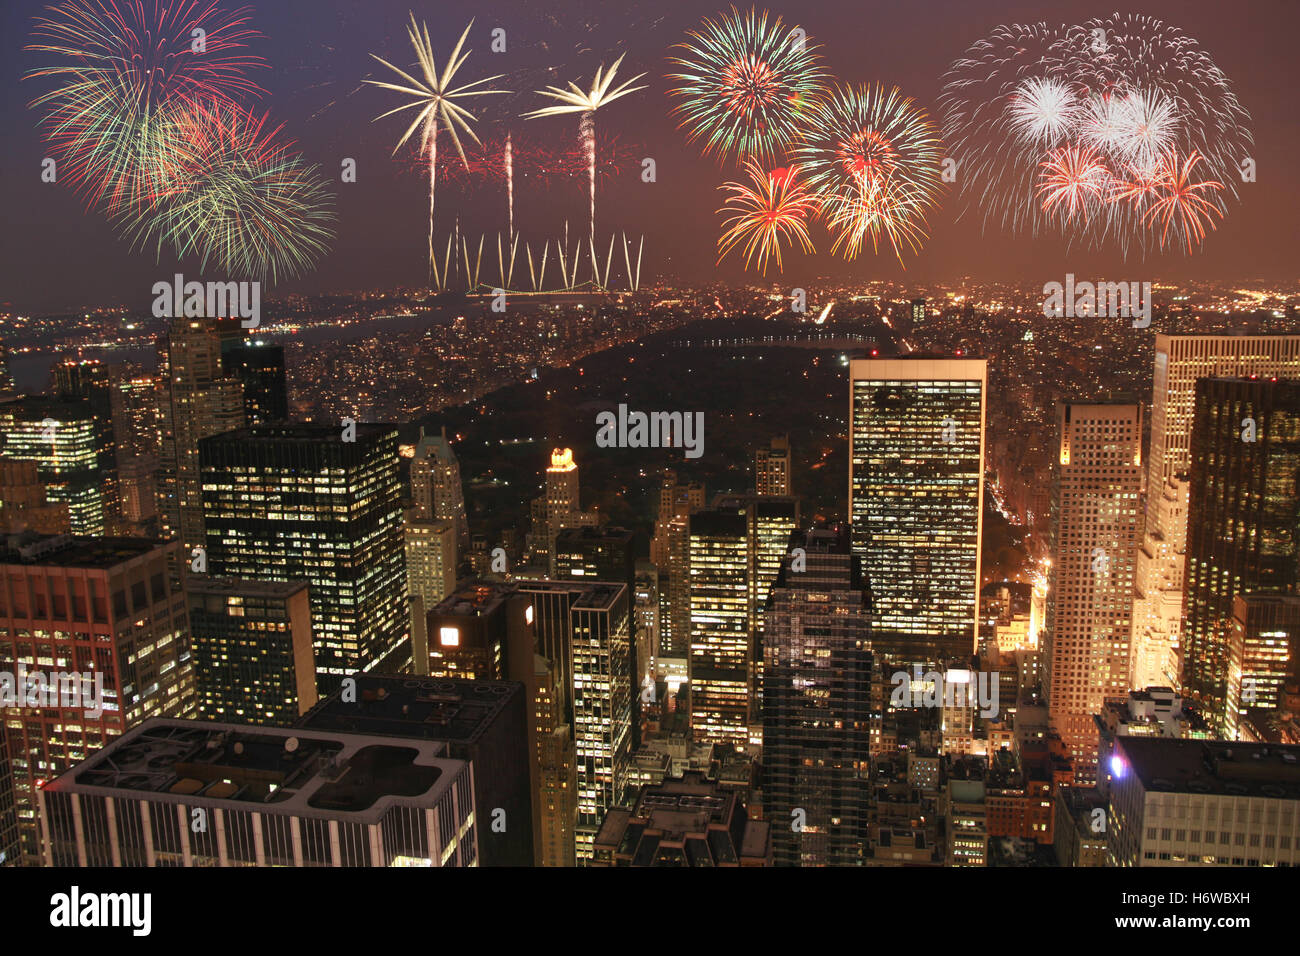 parties holidays - Stock Image